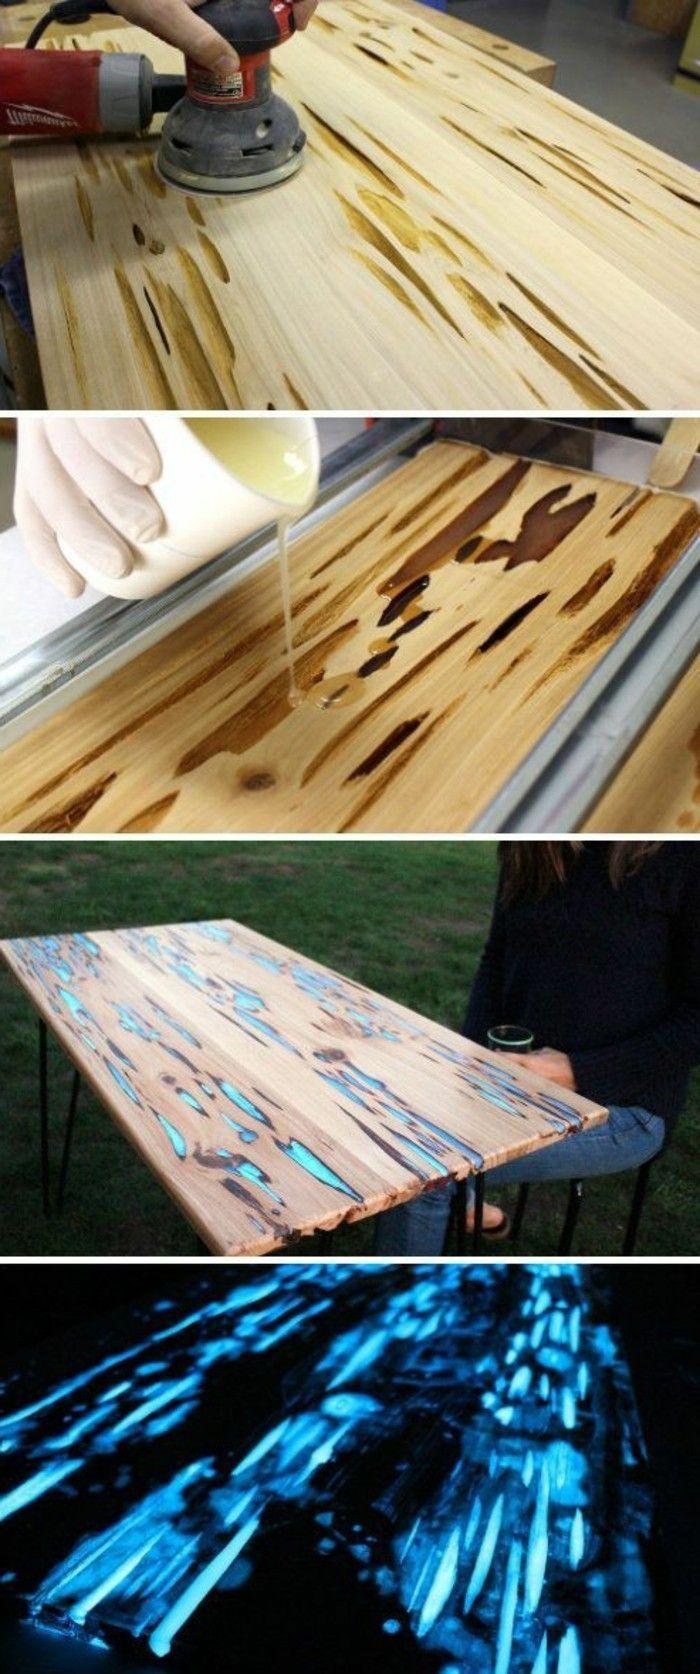 Wohnideen Selfmade wohnideen selfmade how to create a masonjar organizer rustikale